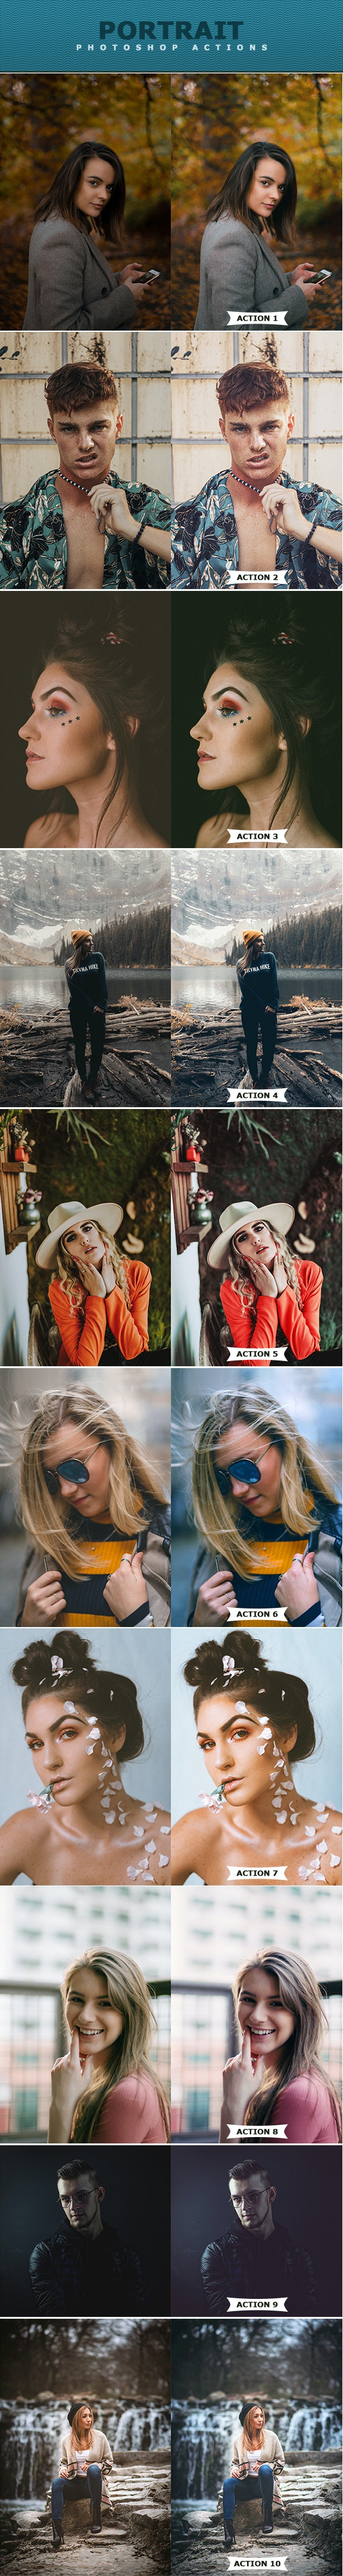 PS动作-人像皮肤修饰磨皮美白效果 Portrait Photoshop Actions插图2